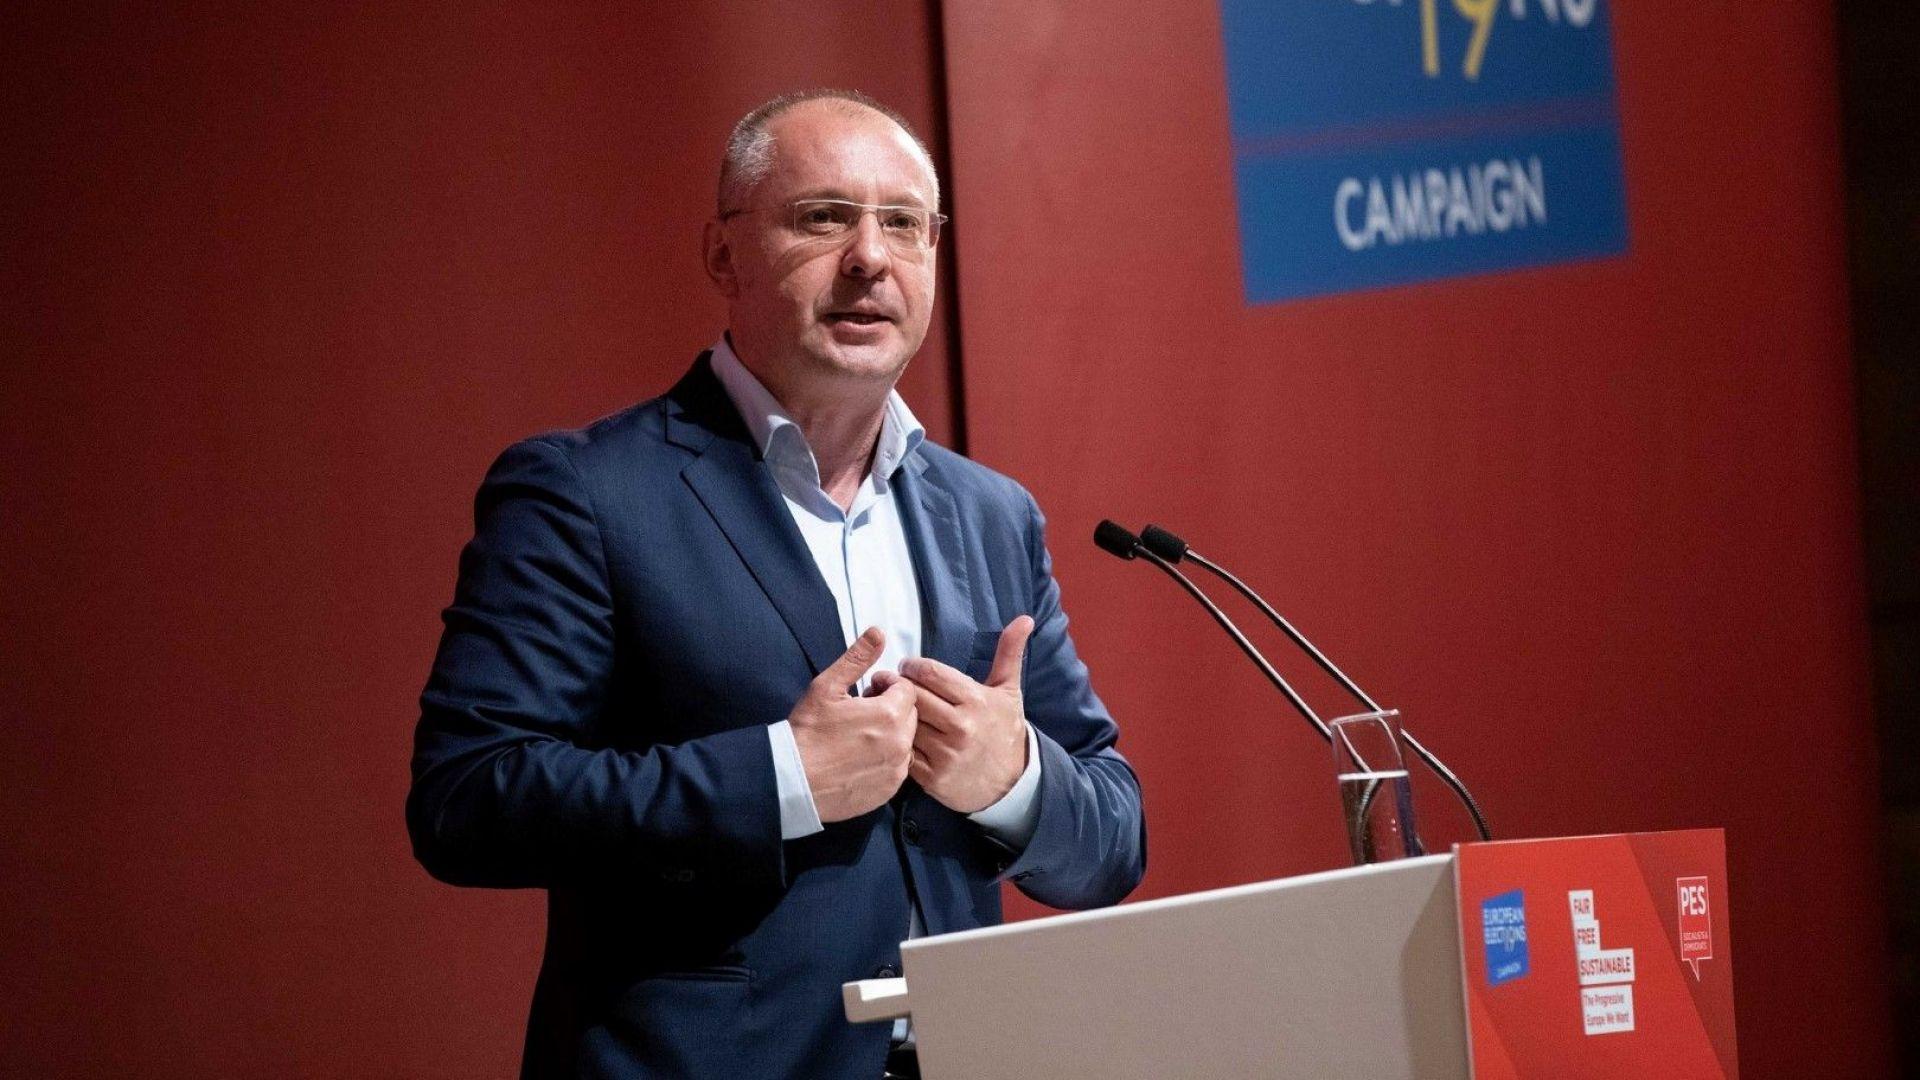 Станишев: Евродепутатите от БСП свършиха важна работа в ЕП